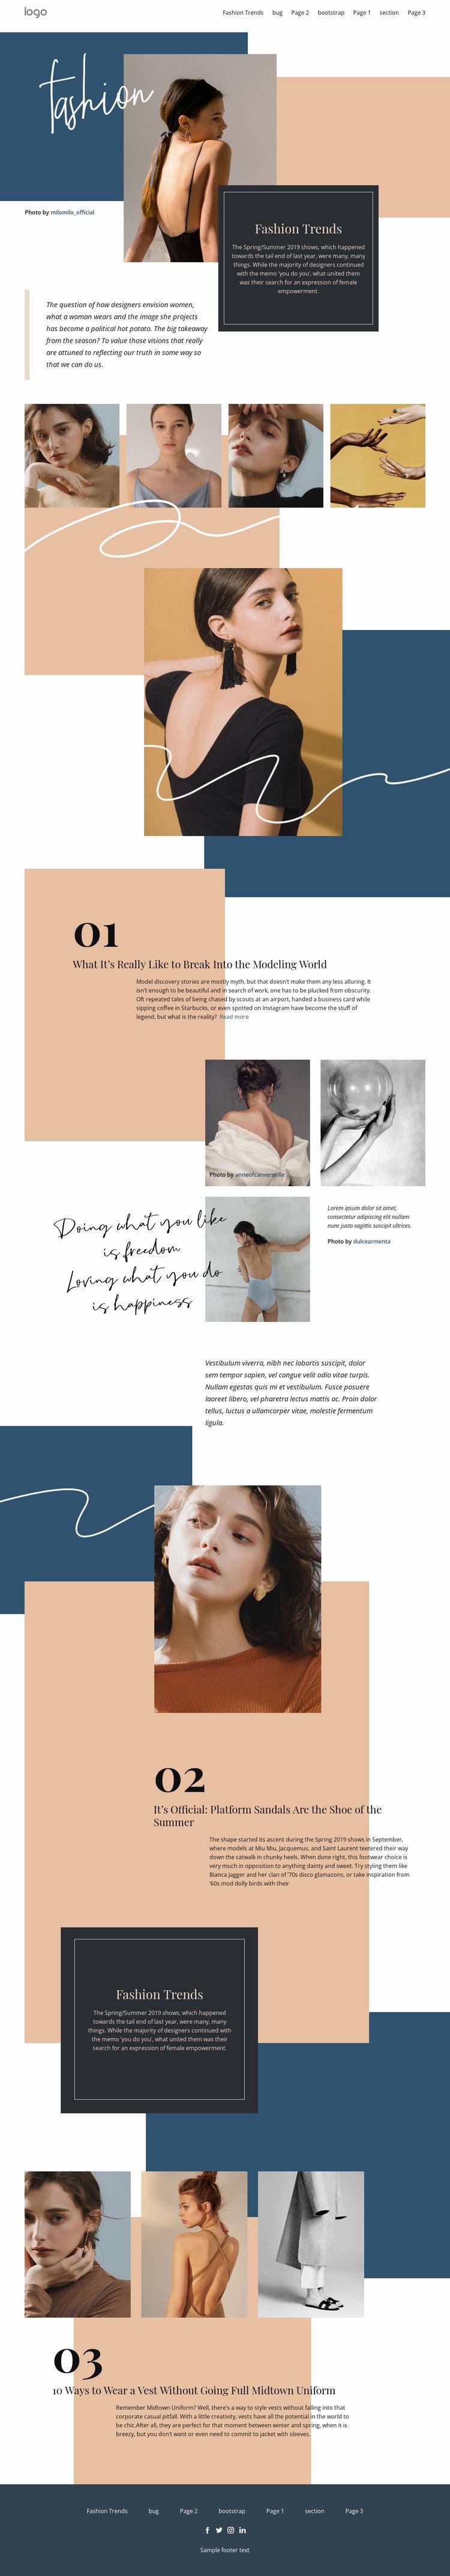 Innovative trends in fashion  Website Builder